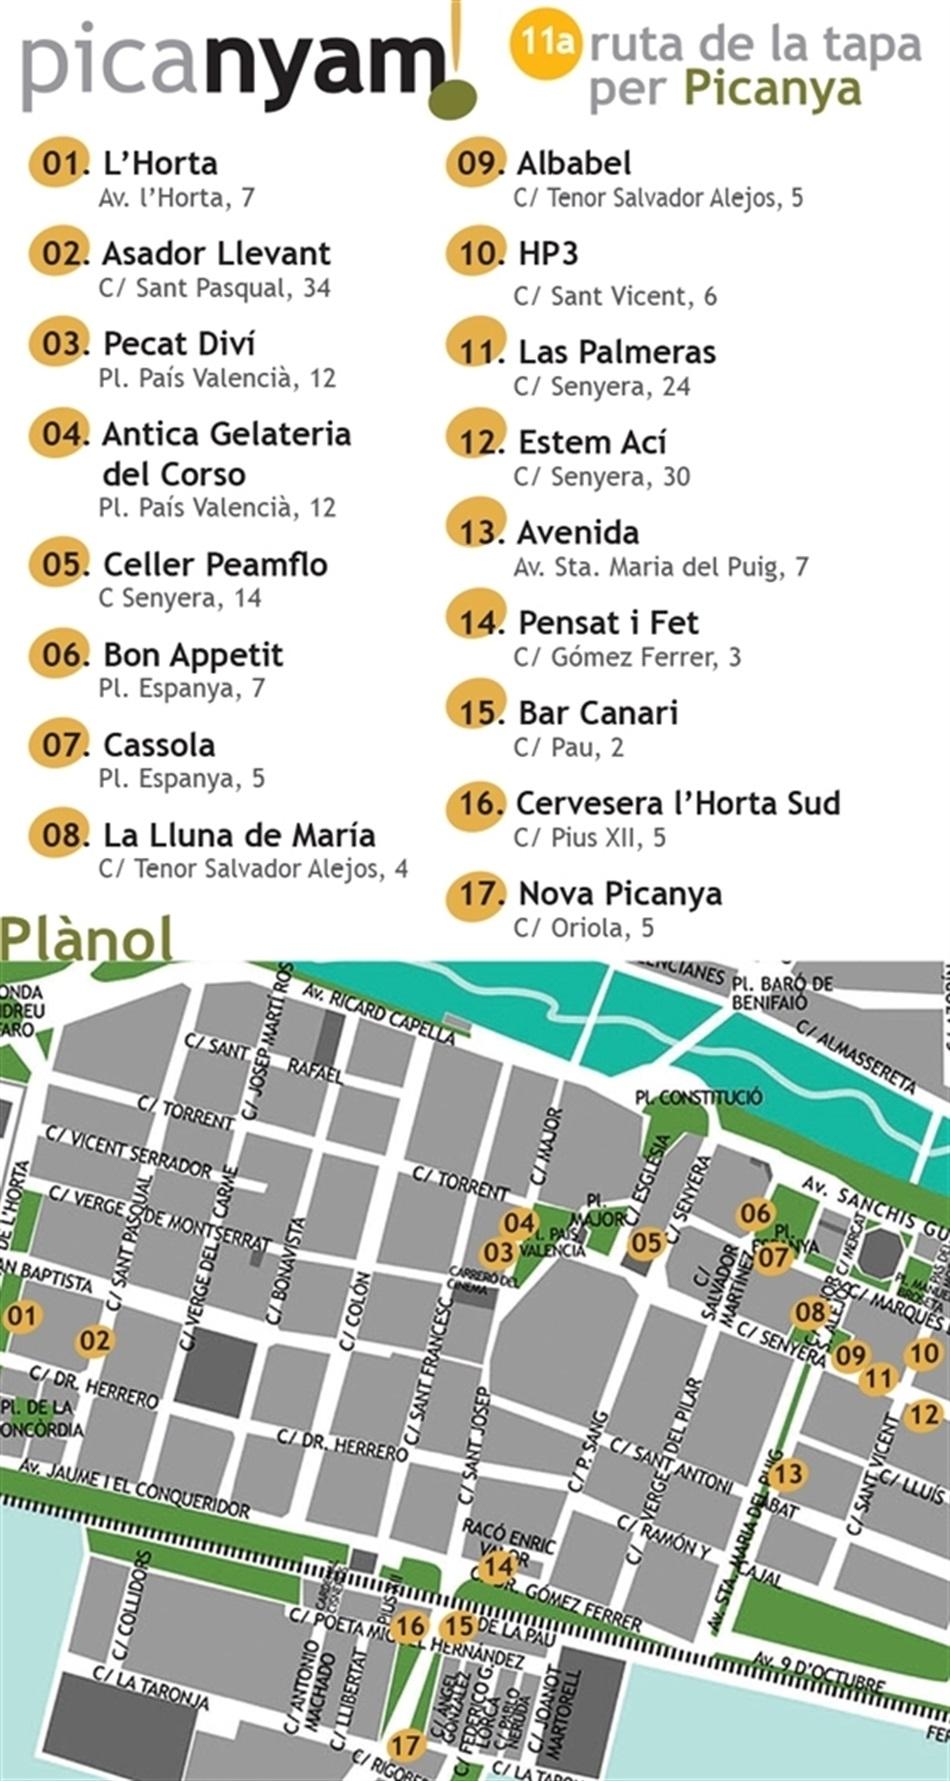 planol_11a_ruta